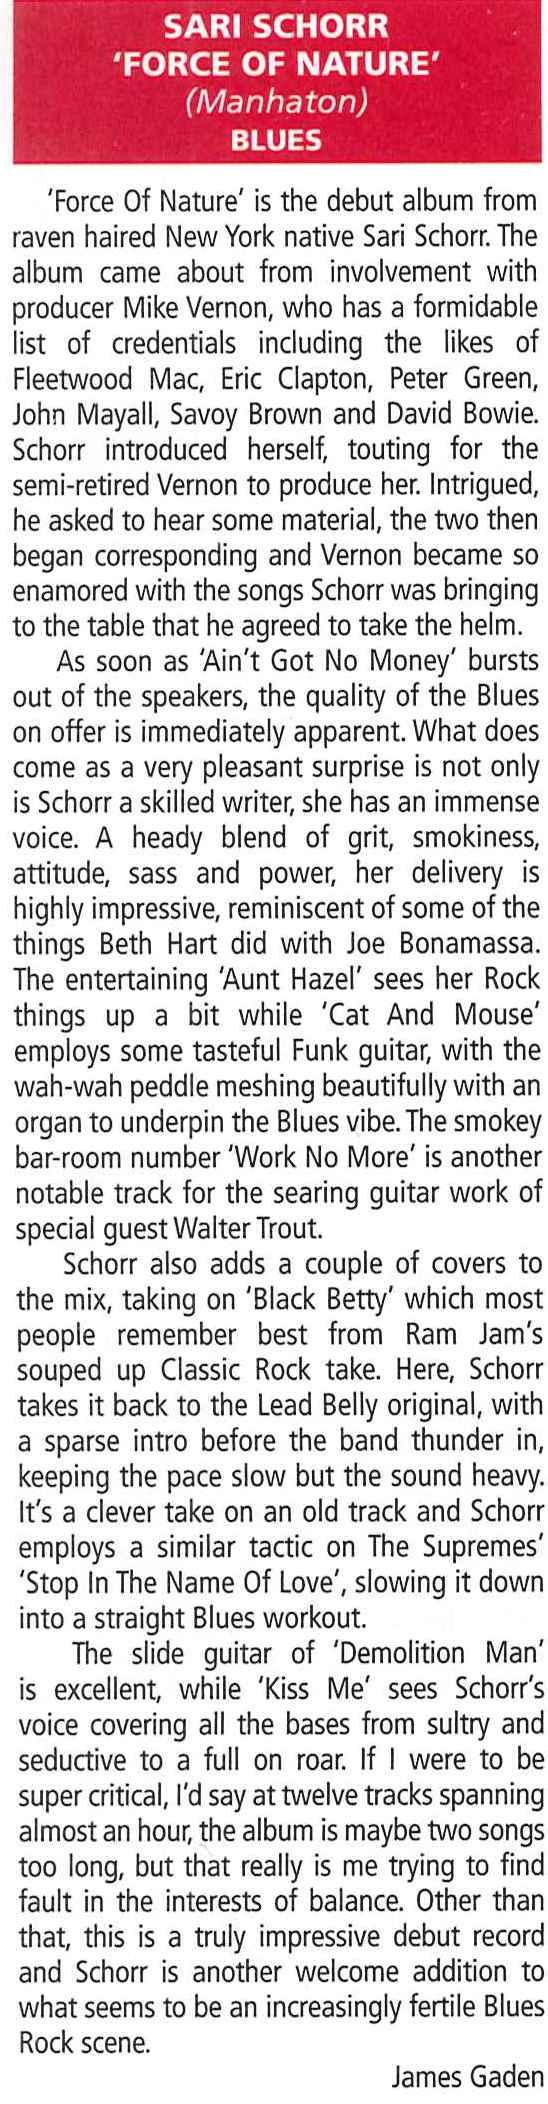 Fireworks Magazine_Oct Dec 2016_Sari Schorr_Album Review_2.jpg